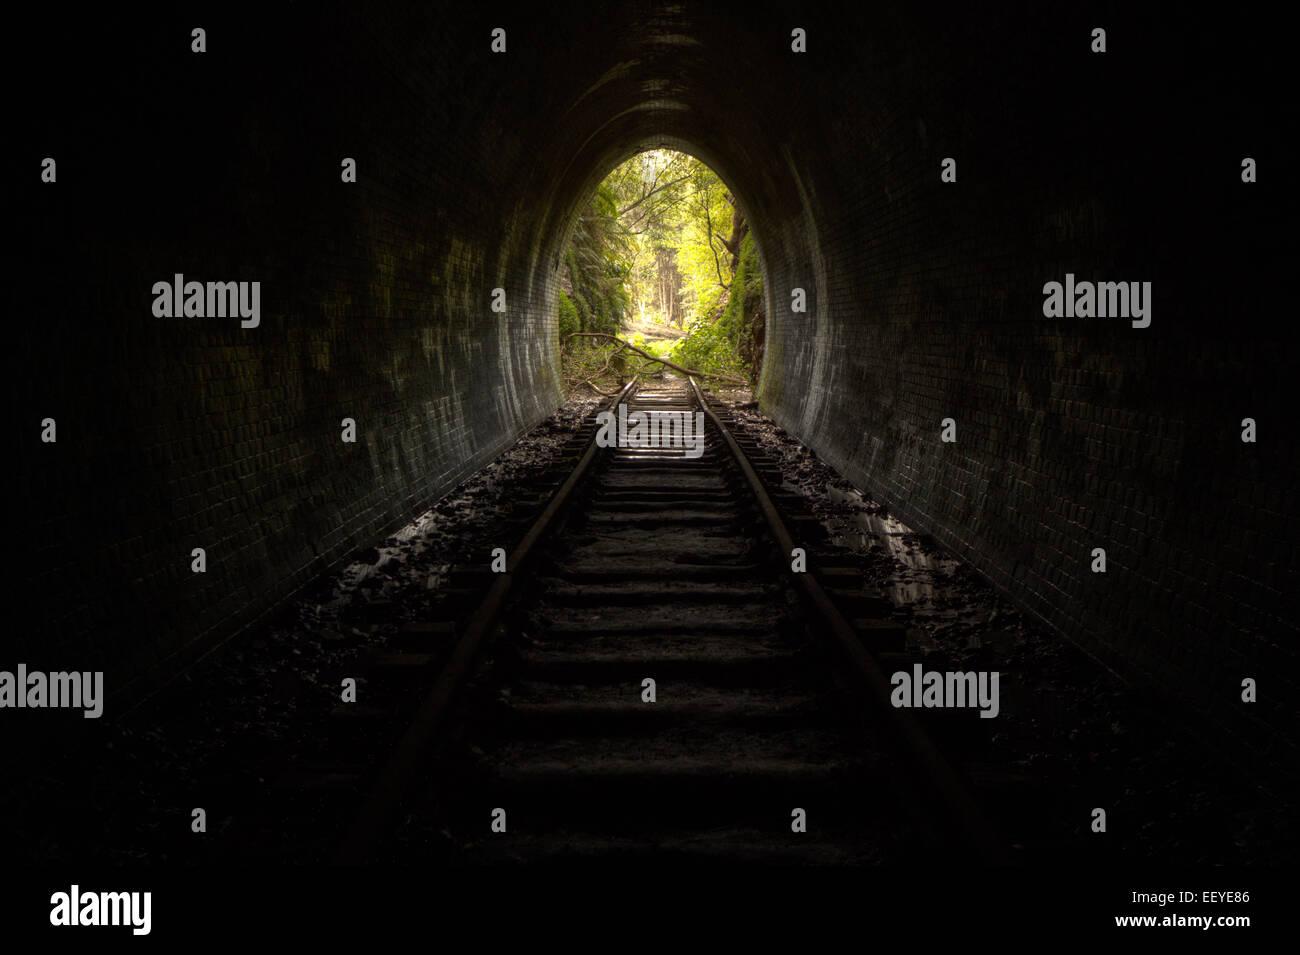 Abandonner le tunnel de train Photo Stock